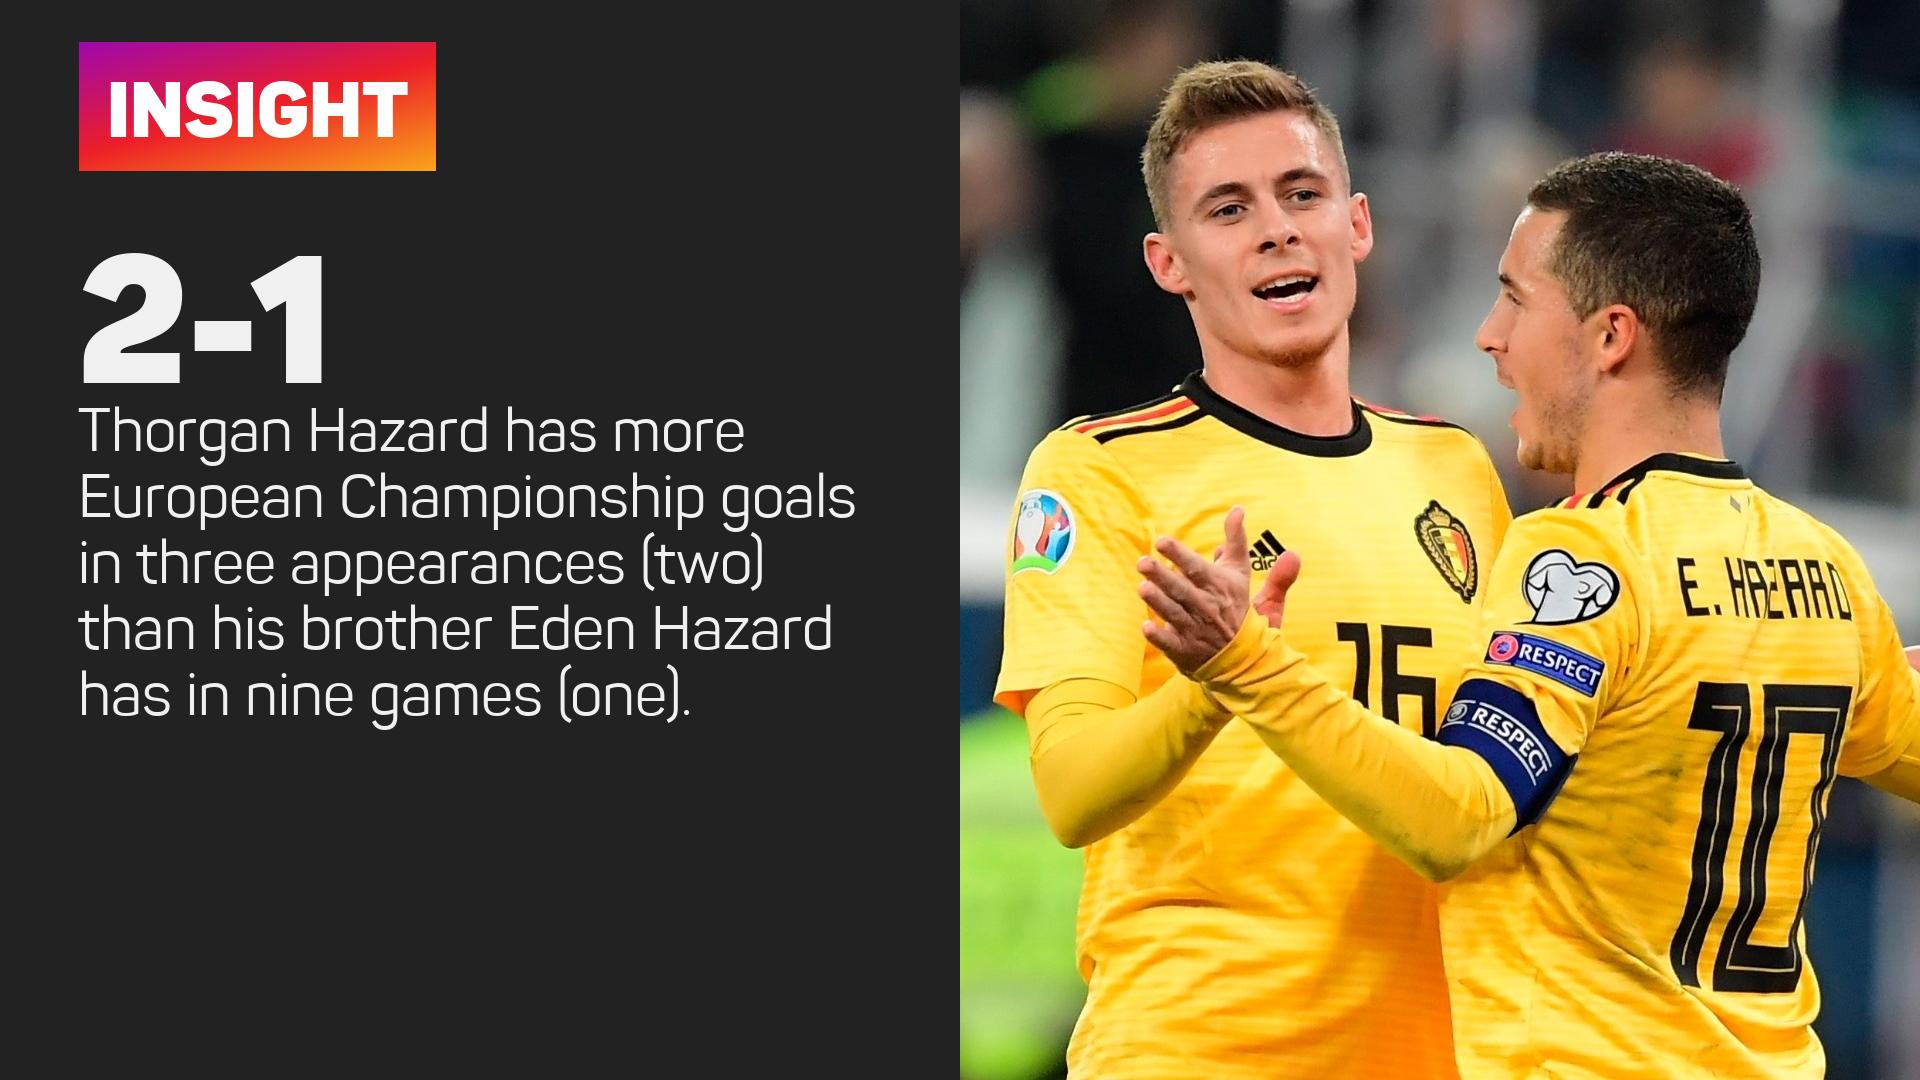 Thorgan Hazard scored again against Portugal